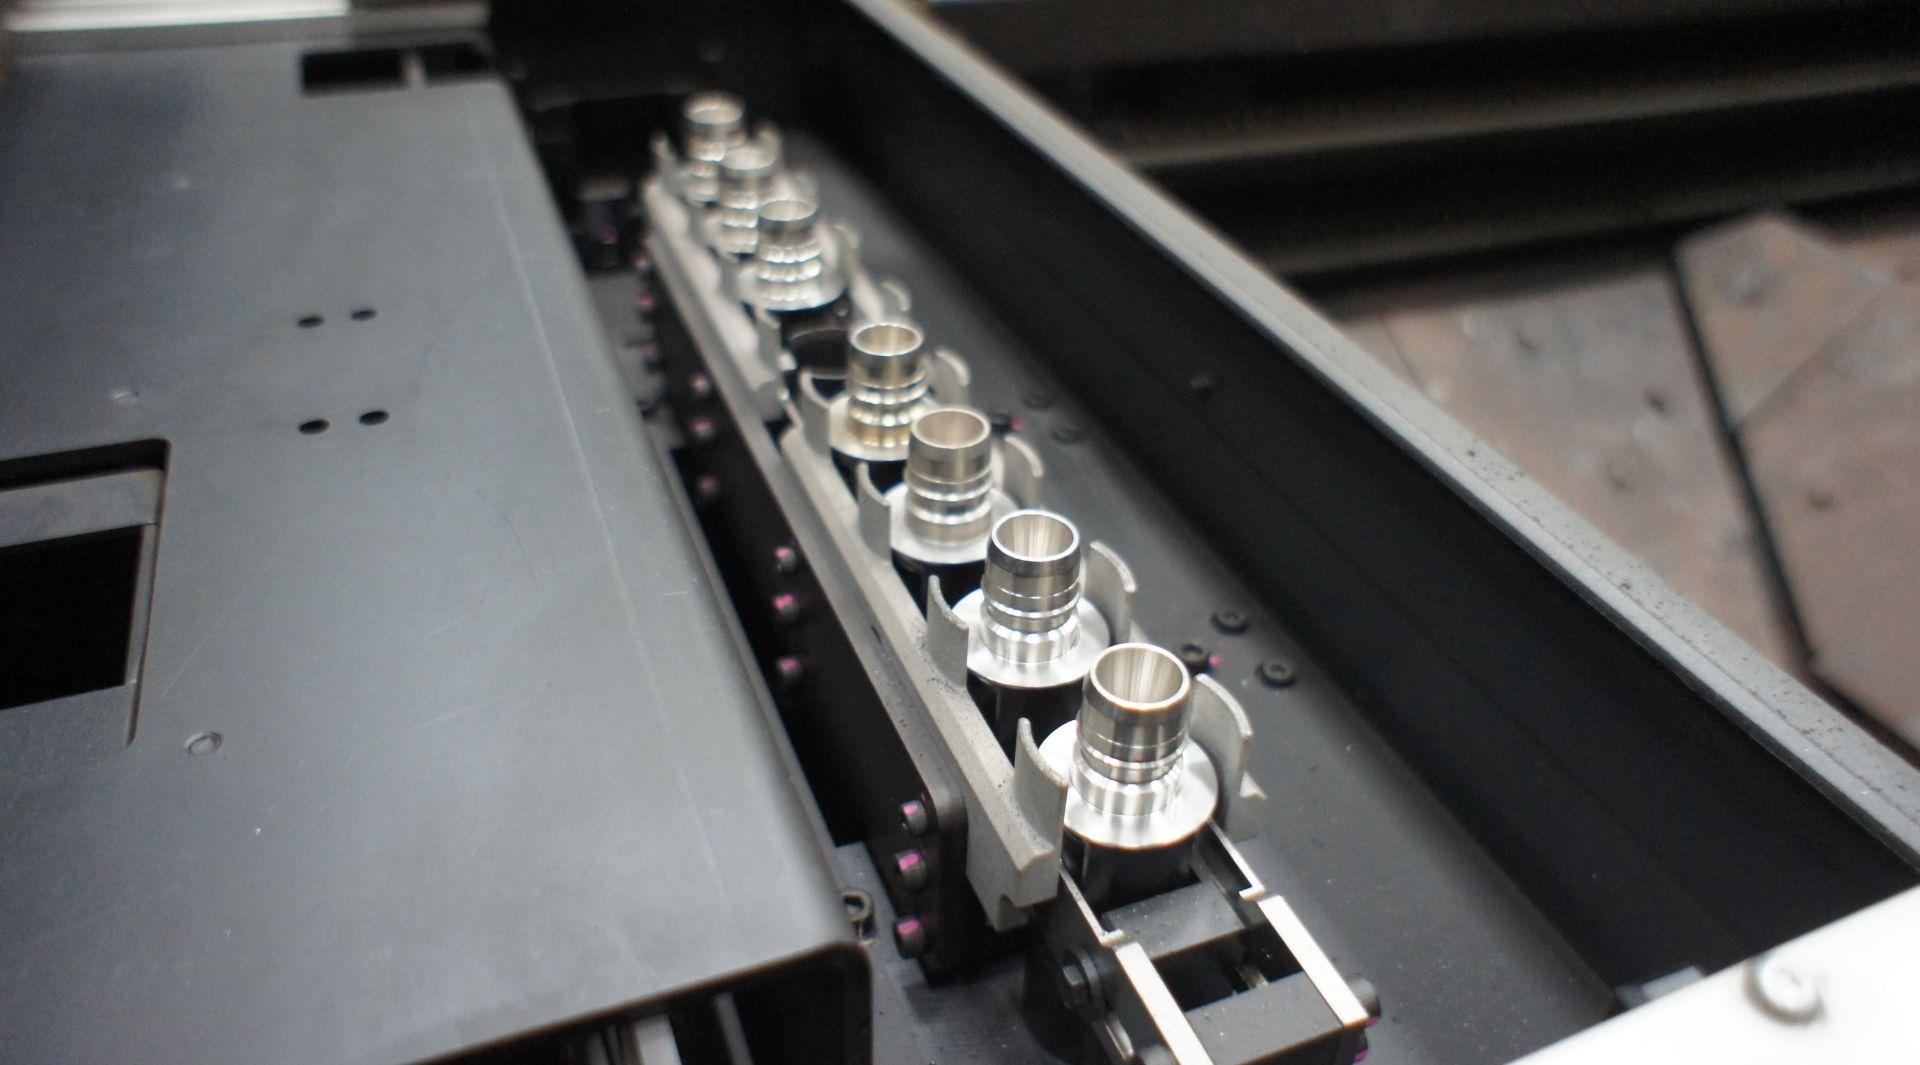 2015 - Mazak OptiPlex 4020 II Laser Cutting Machin - Image 4 of 15